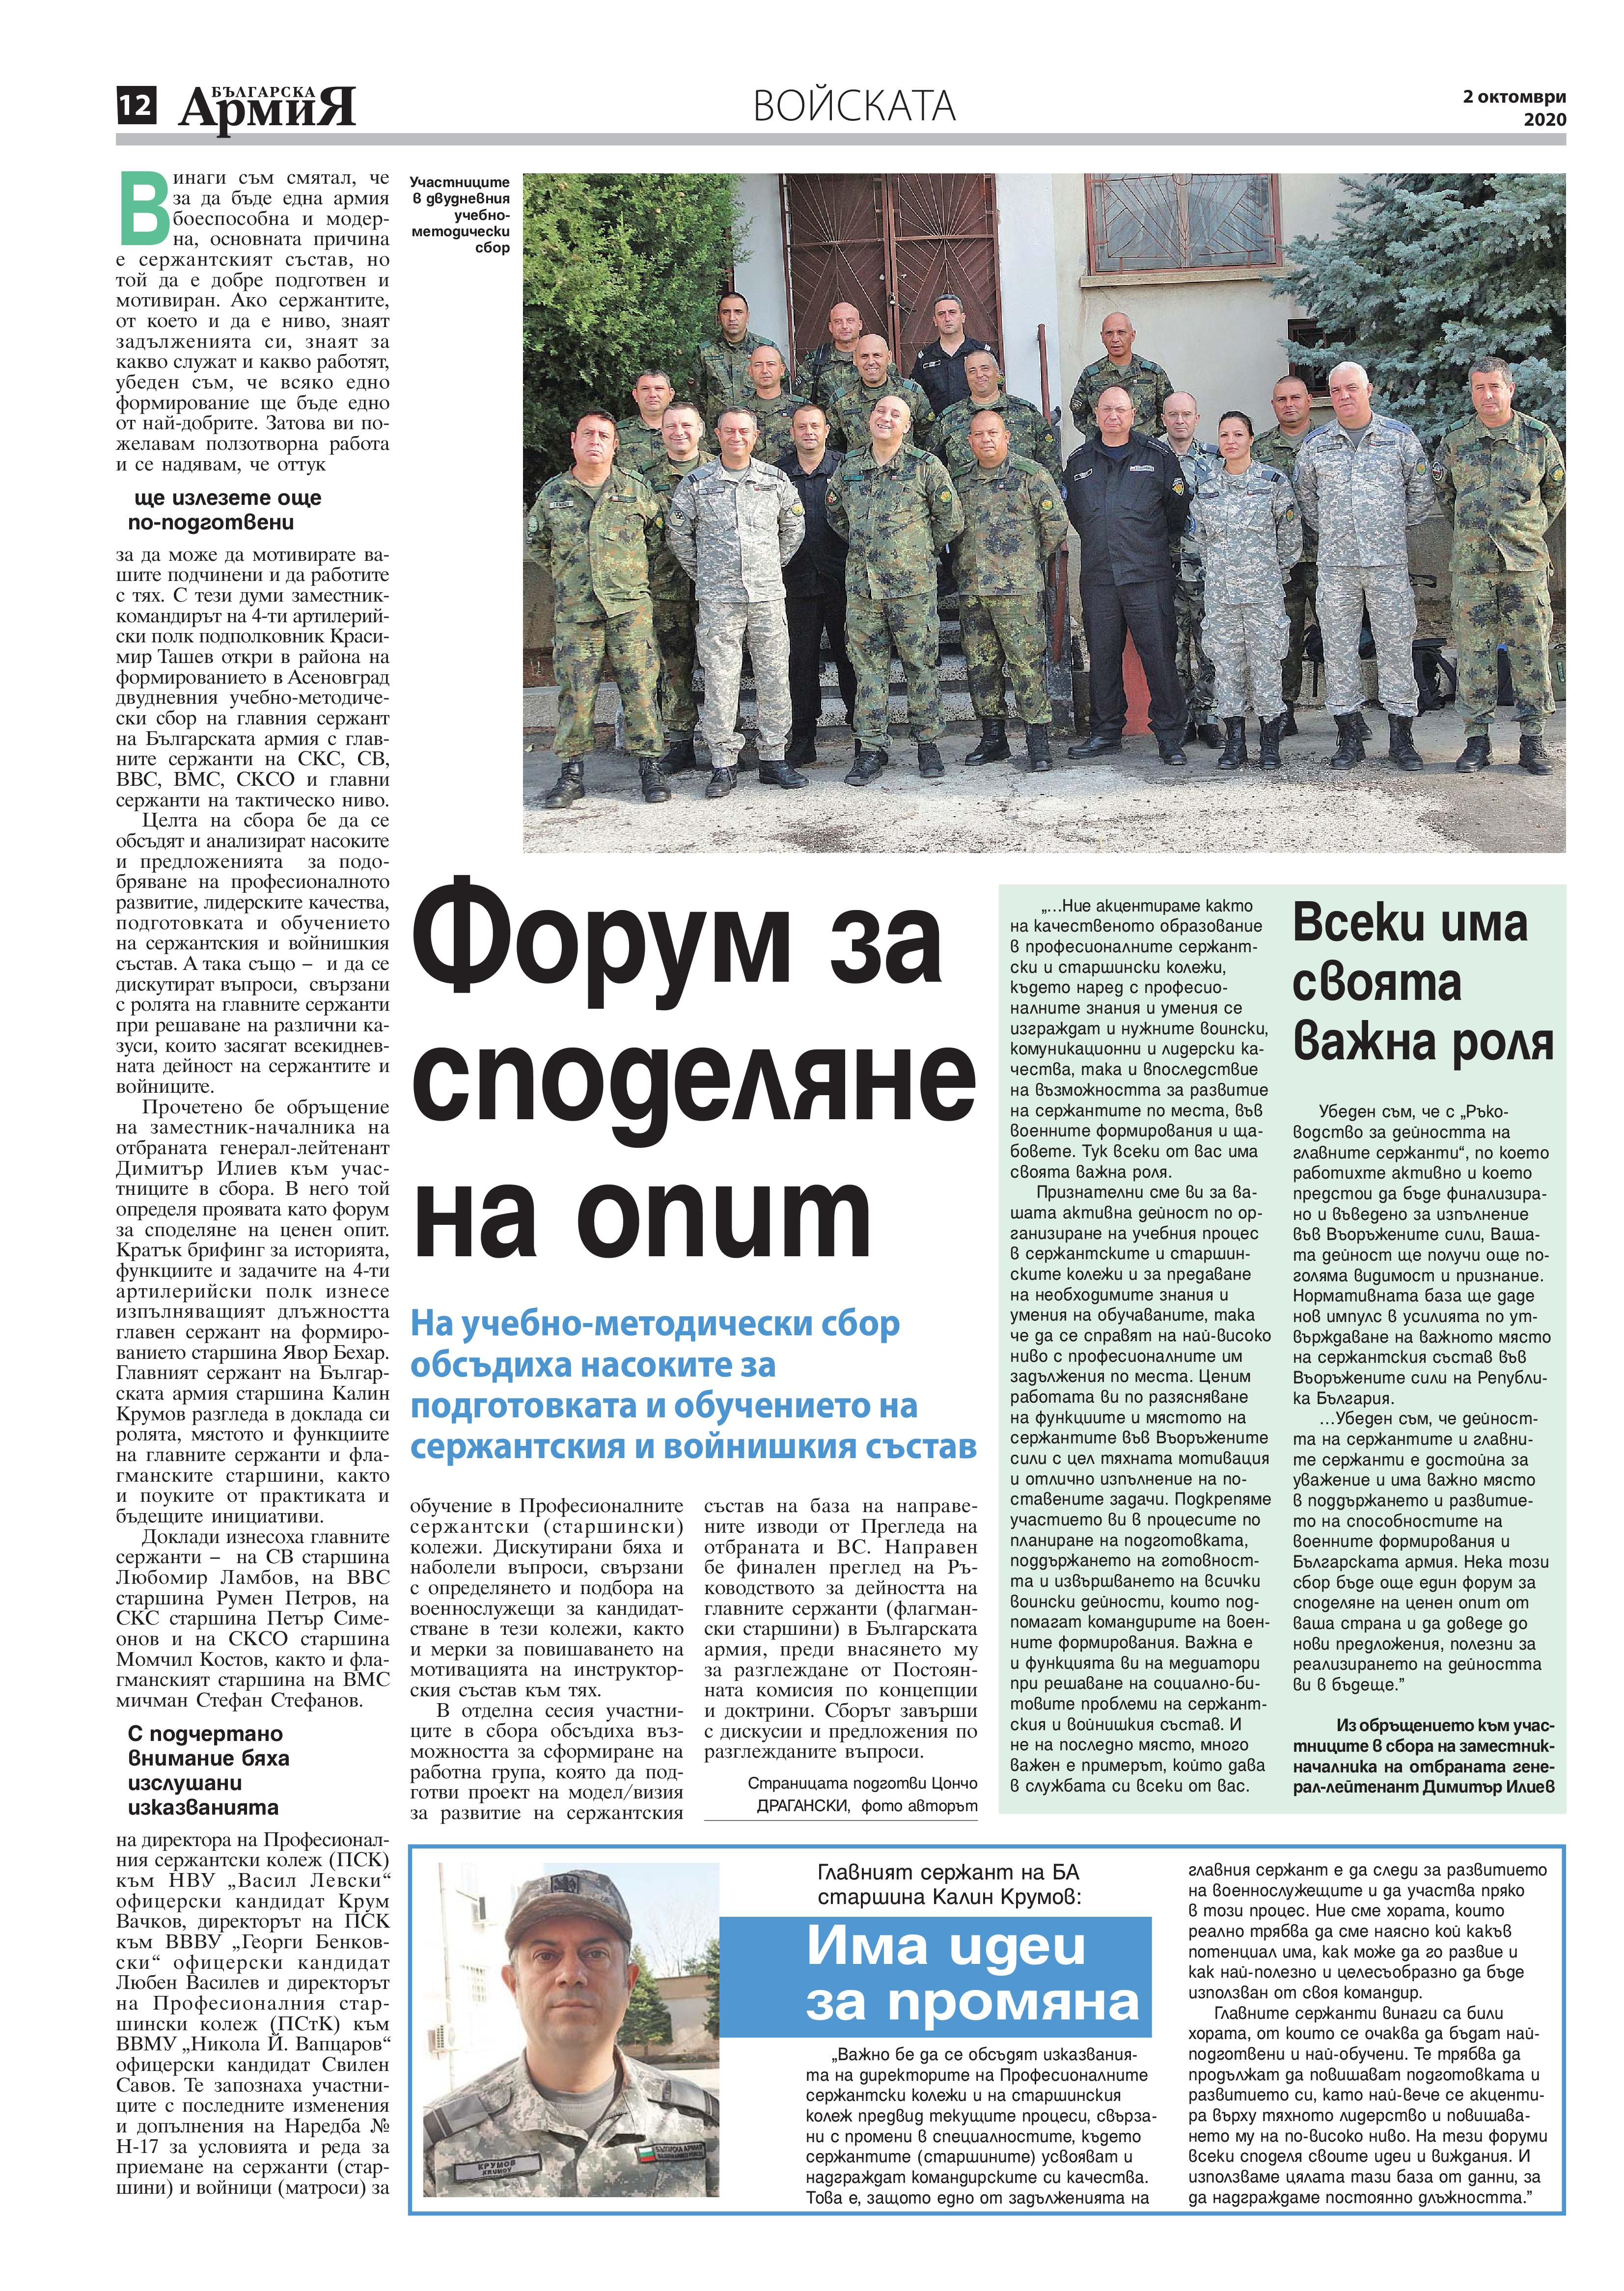 https://armymedia.bg/wp-content/uploads/2015/06/12-42.jpg